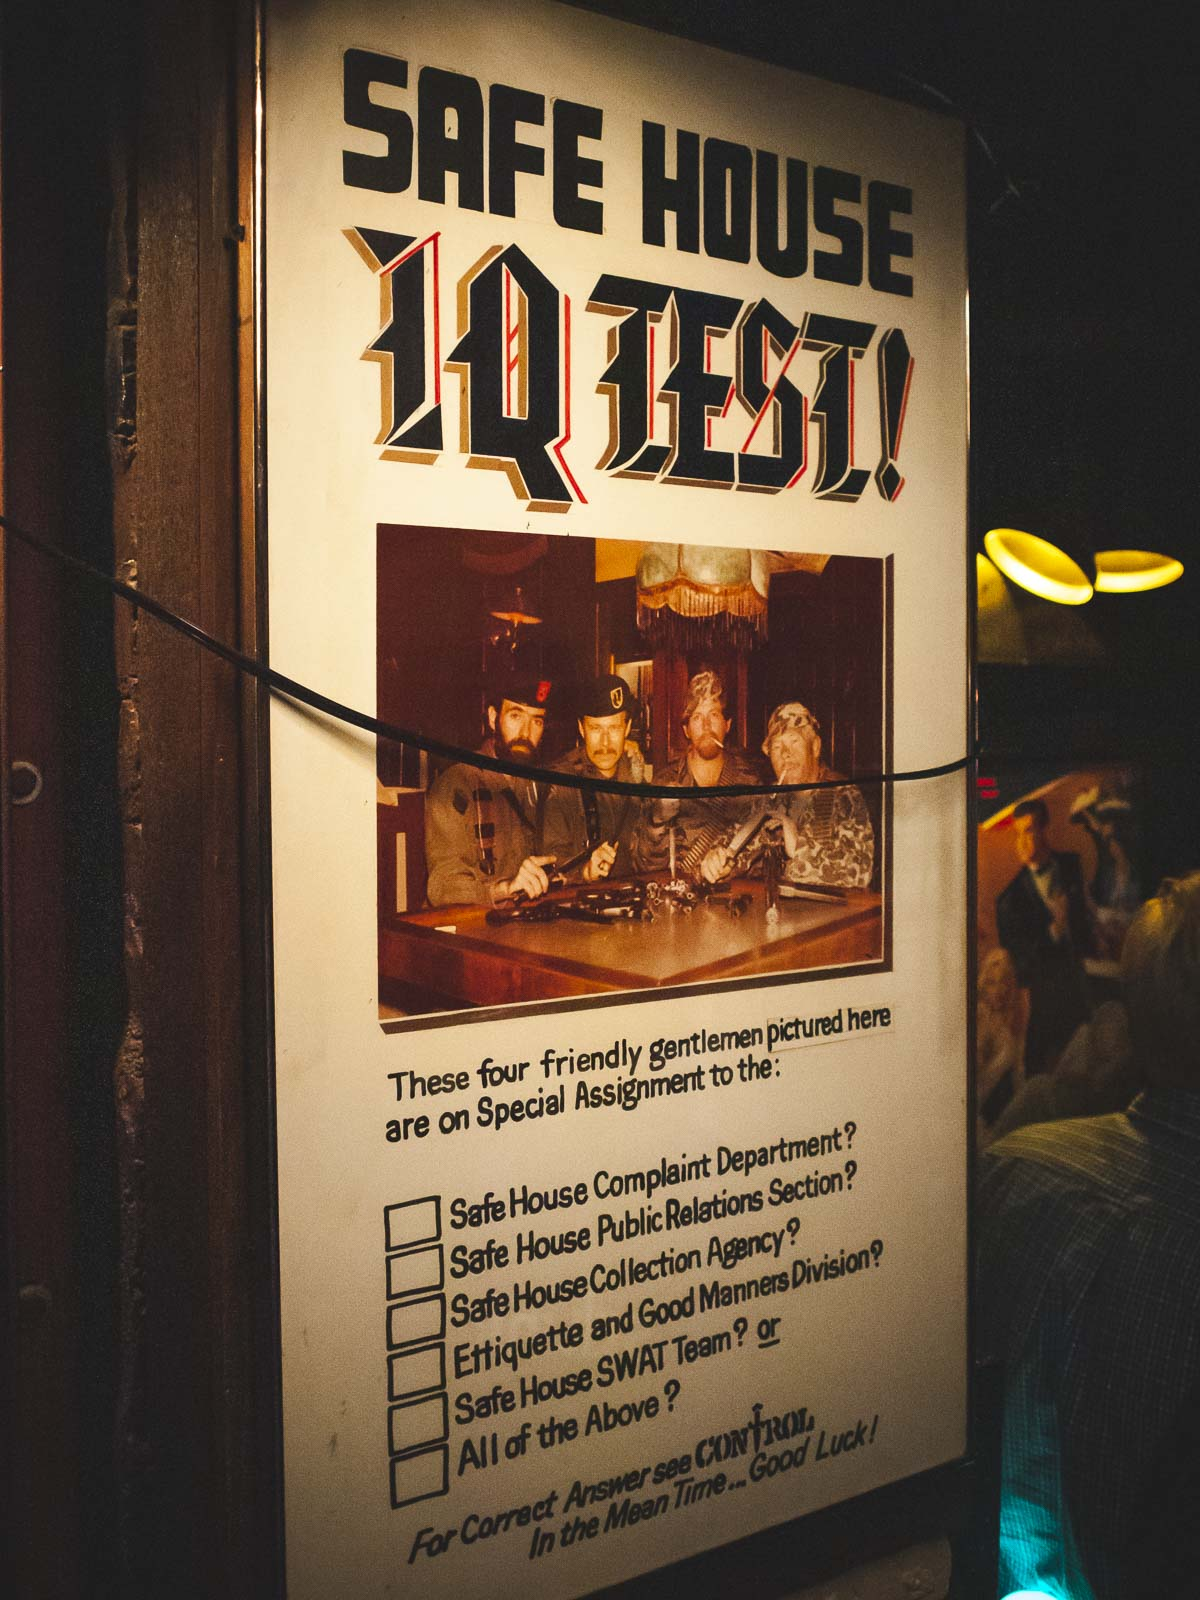 The Safe House Speakeasy in Milwaukee